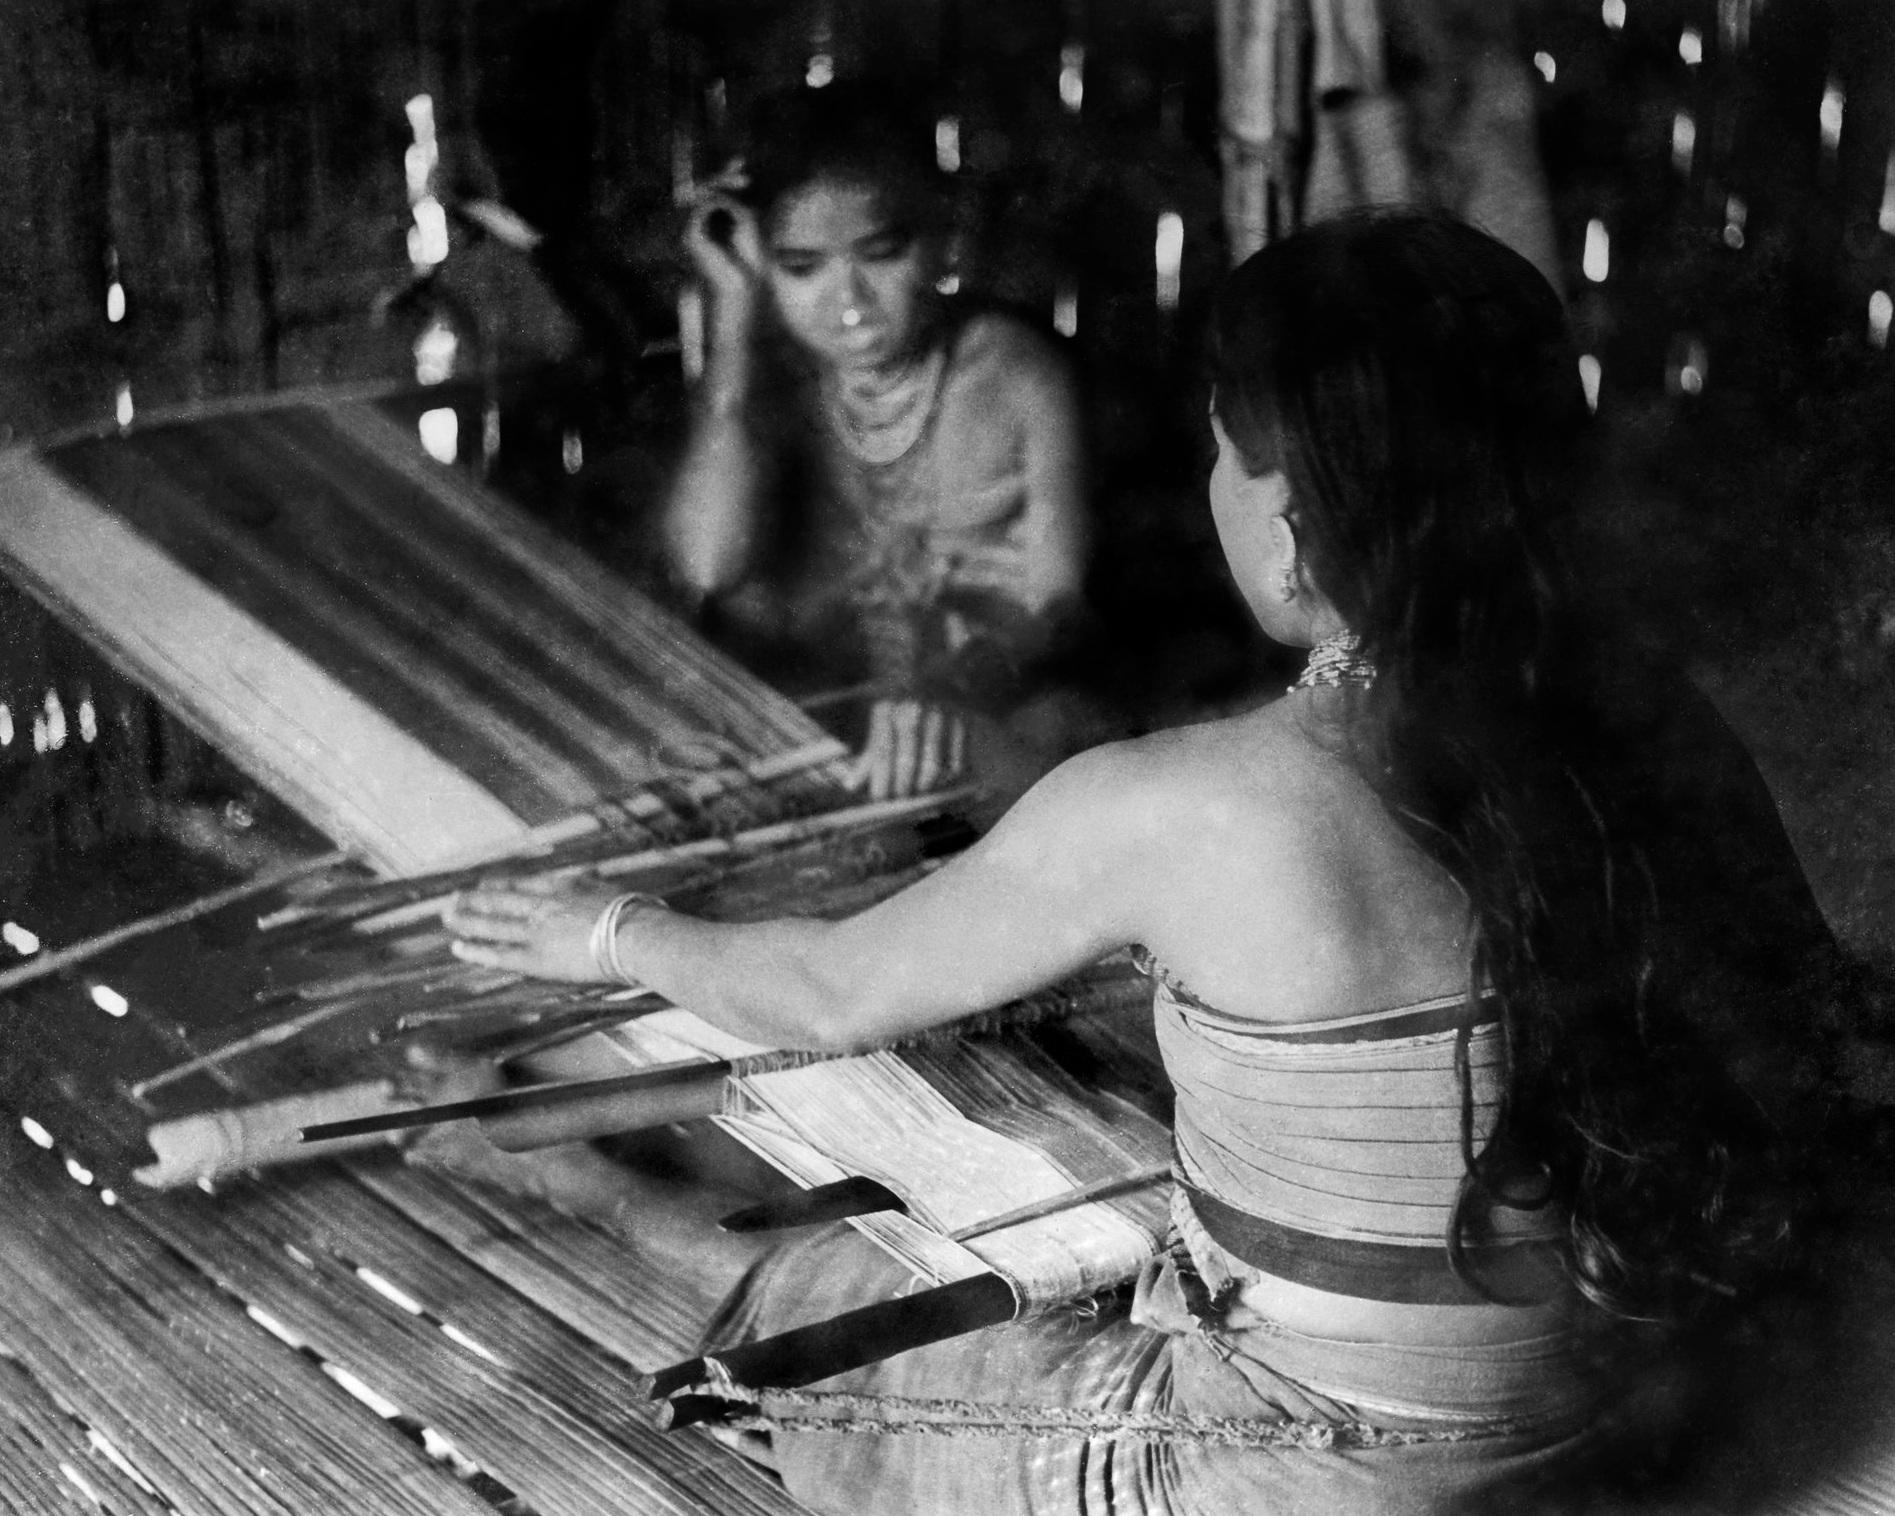 Tripuri woman weaving one half of a Rignai (traditional wrap skirt) with a white border on a  ri thanti , or backstrap loom.  c.1974